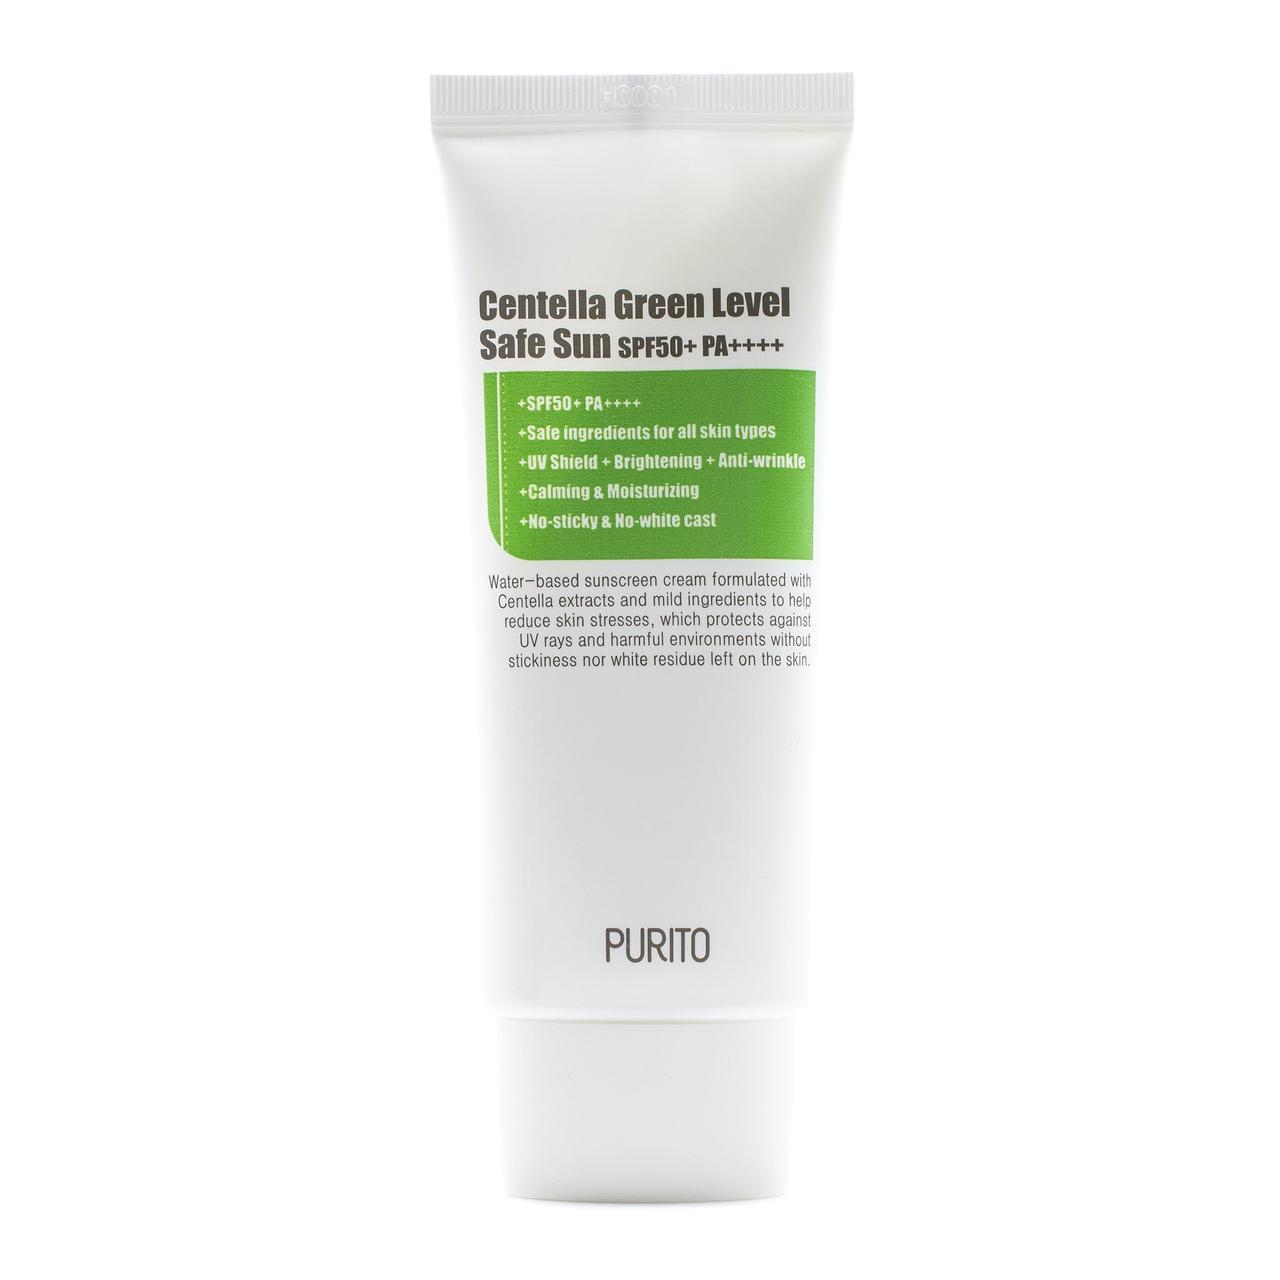 Purito Centella Green Level Safe Sun Cream SPF50 Солнцезащитный крем с центеллой